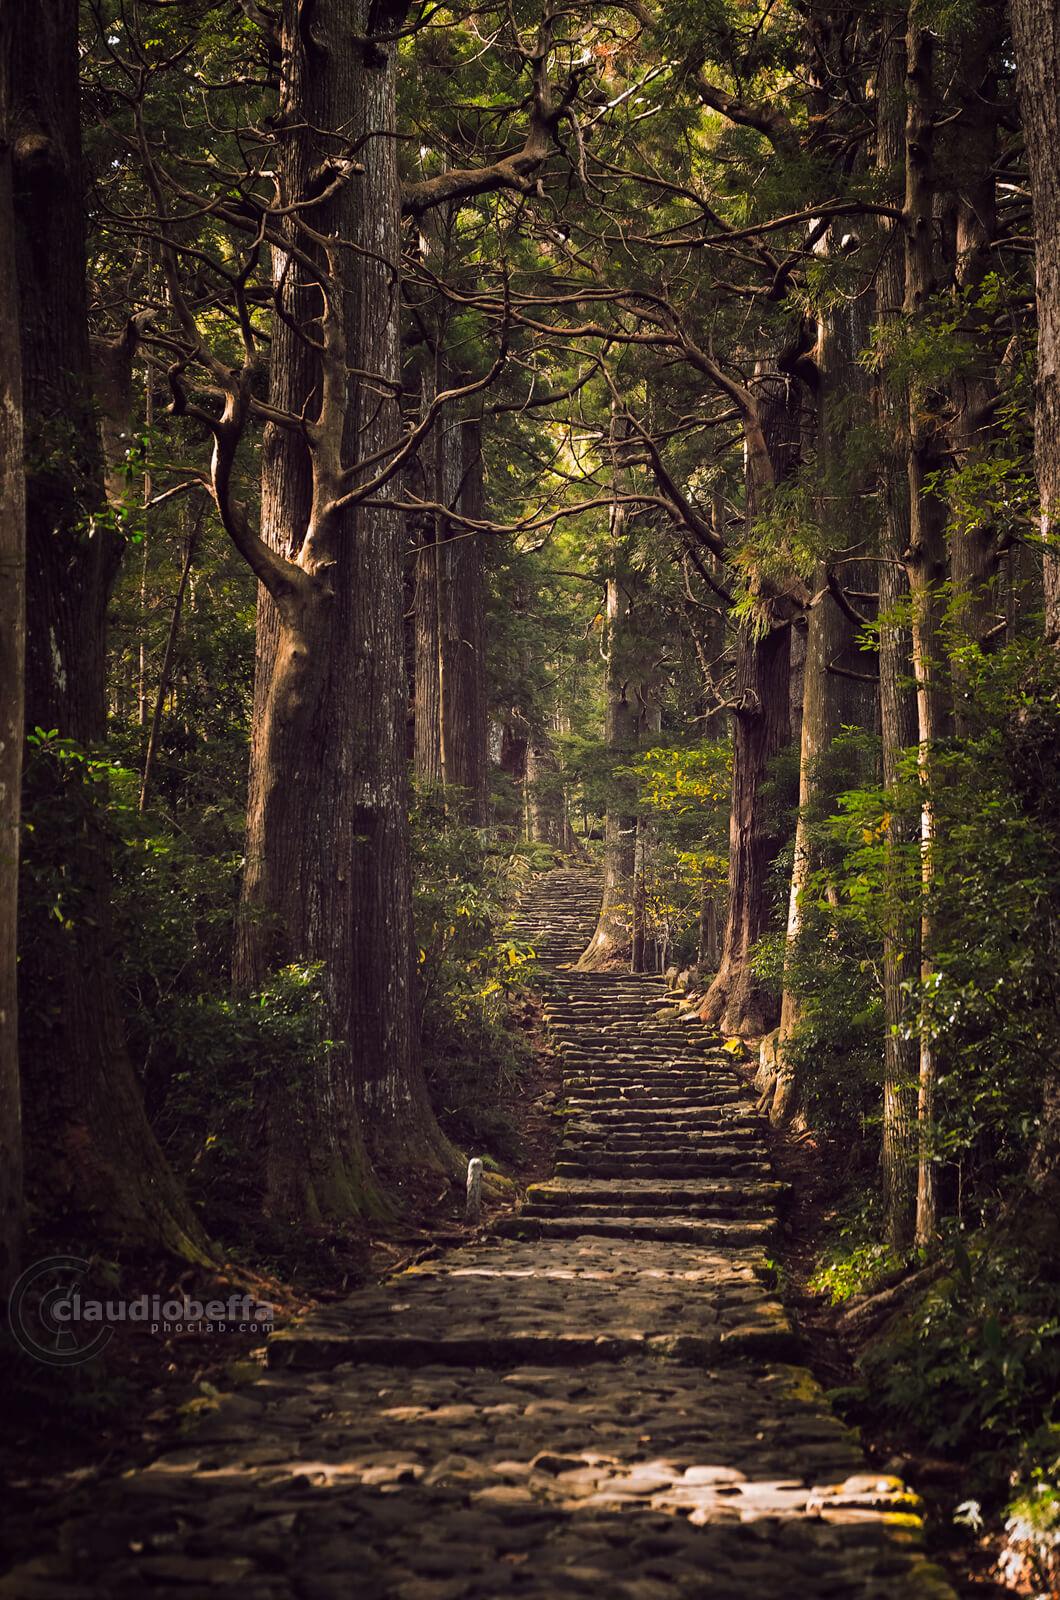 Daimon-zaka, Stairway, Pilgrimage path, Forest, Cobblestones, Cedar trees, Suginoki, Kii peninsula, Kumano, Japan